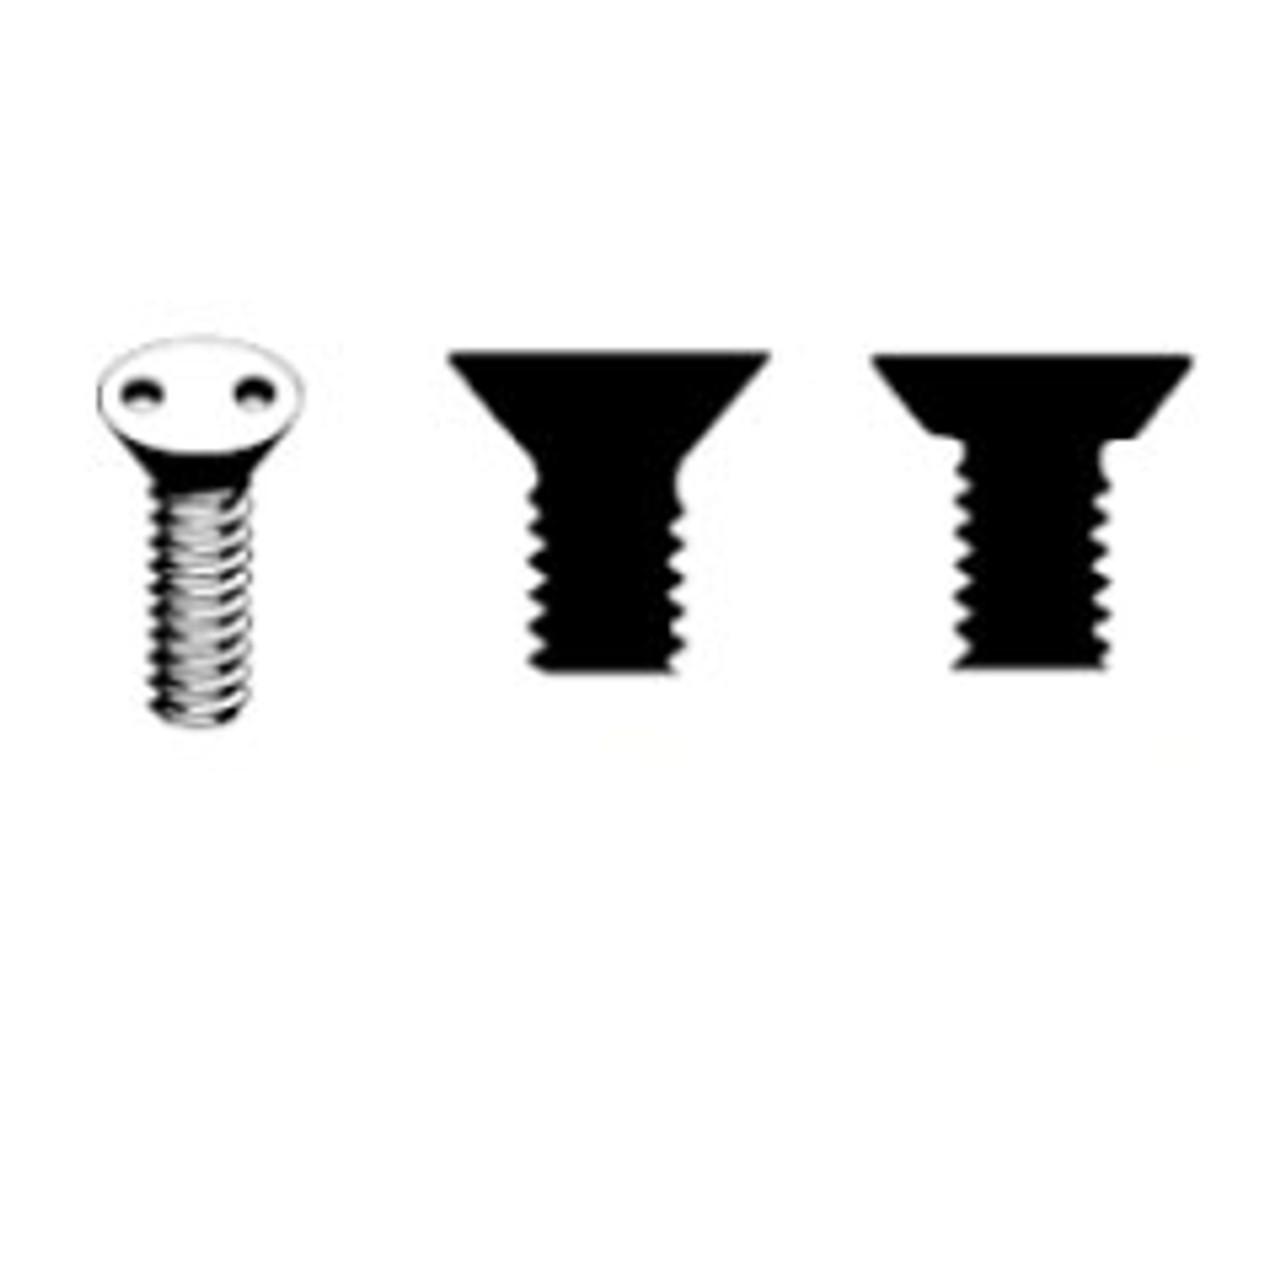 #8-32 Spanner Snake Eye Flat Head Security Machine Screws